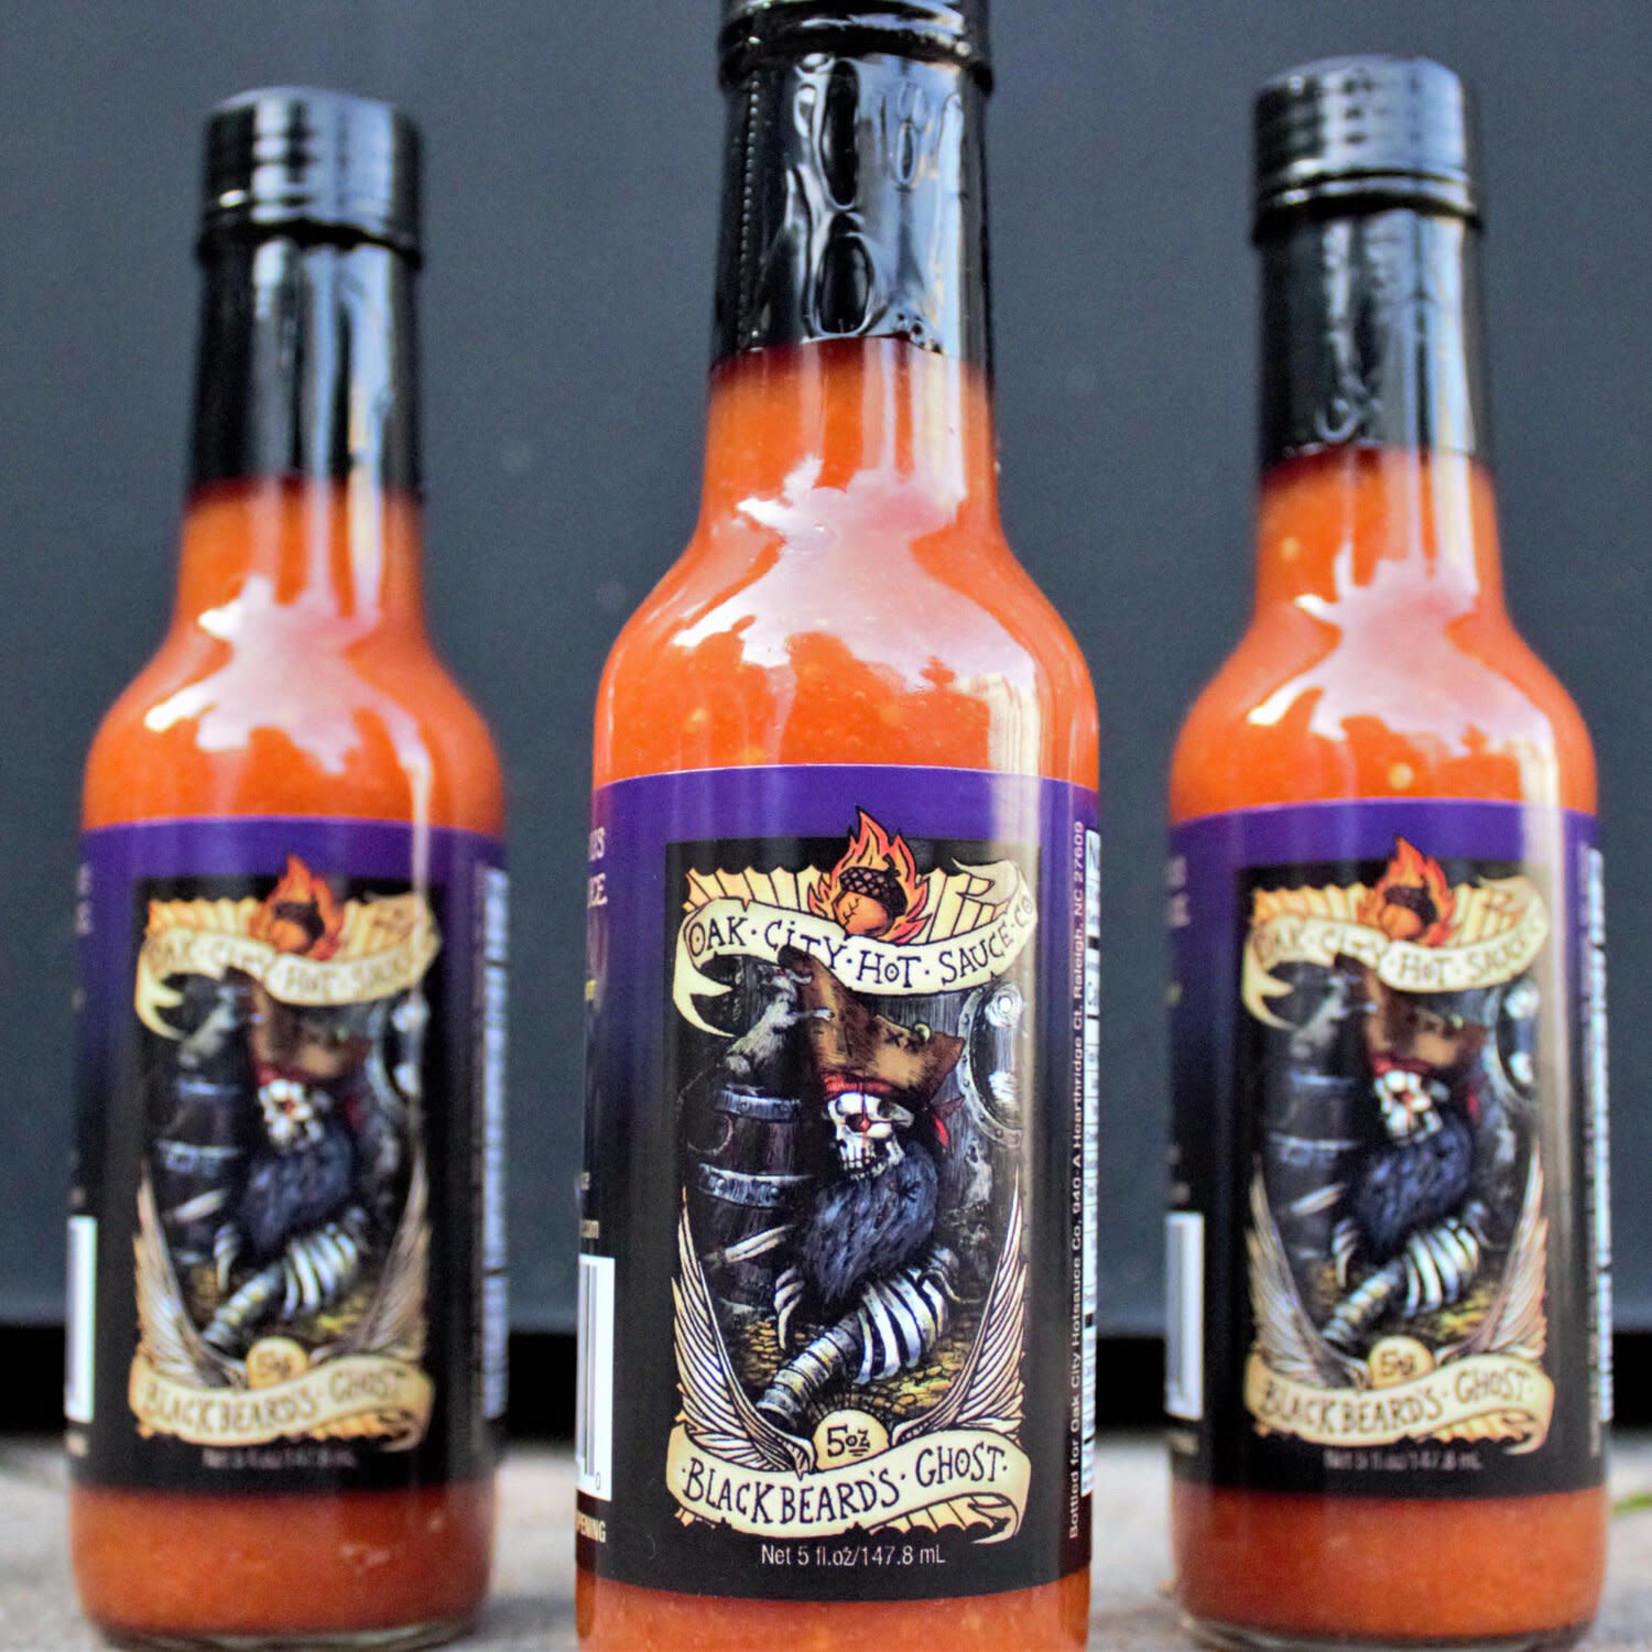 Oak City Hot Sauce Co. Oak City Hot Sauce